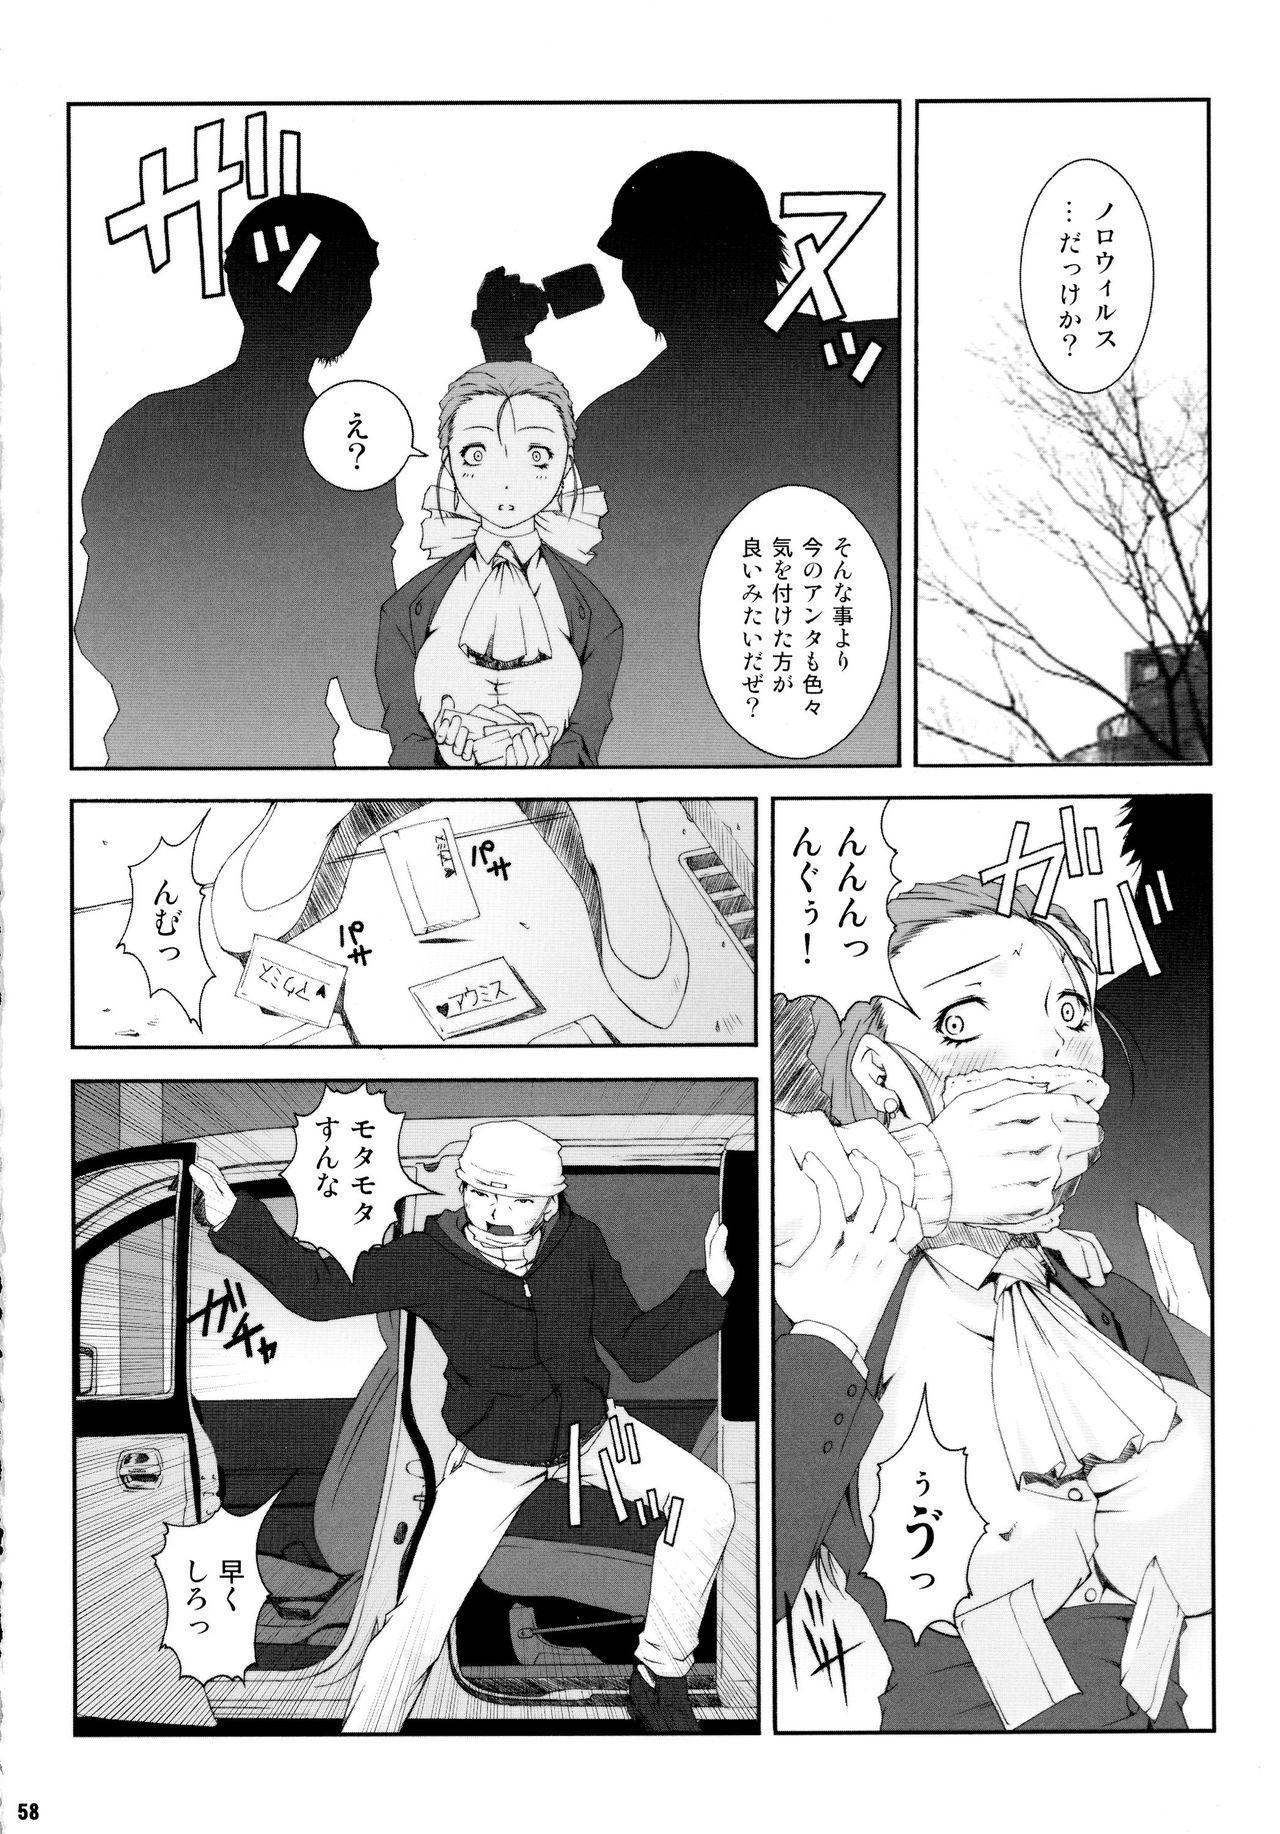 Misoka no 5 57